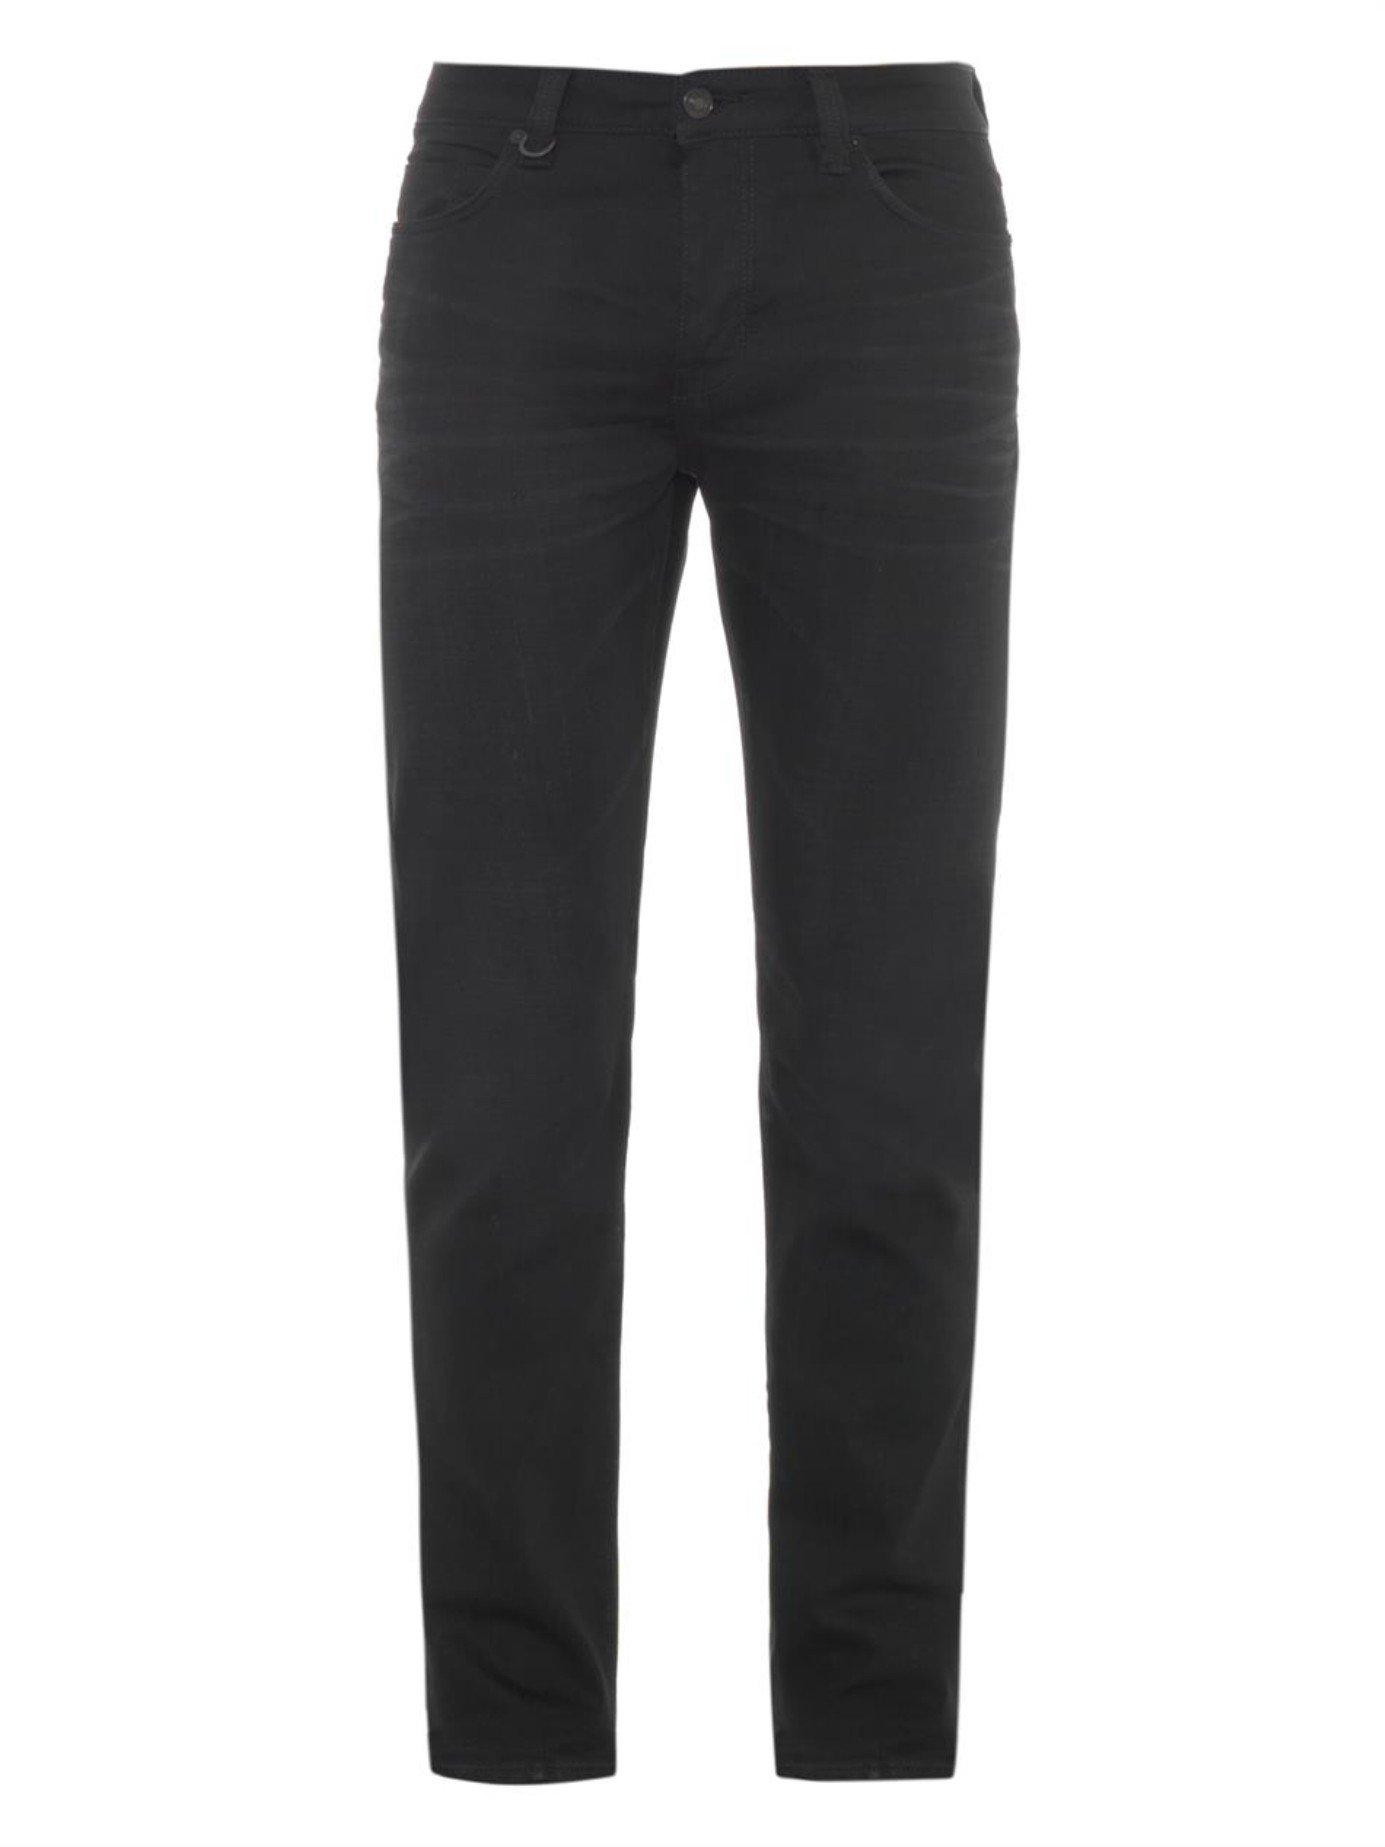 Neuw Iggy Black Rope Skinny-Leg Jeans in Black for Men | Lyst